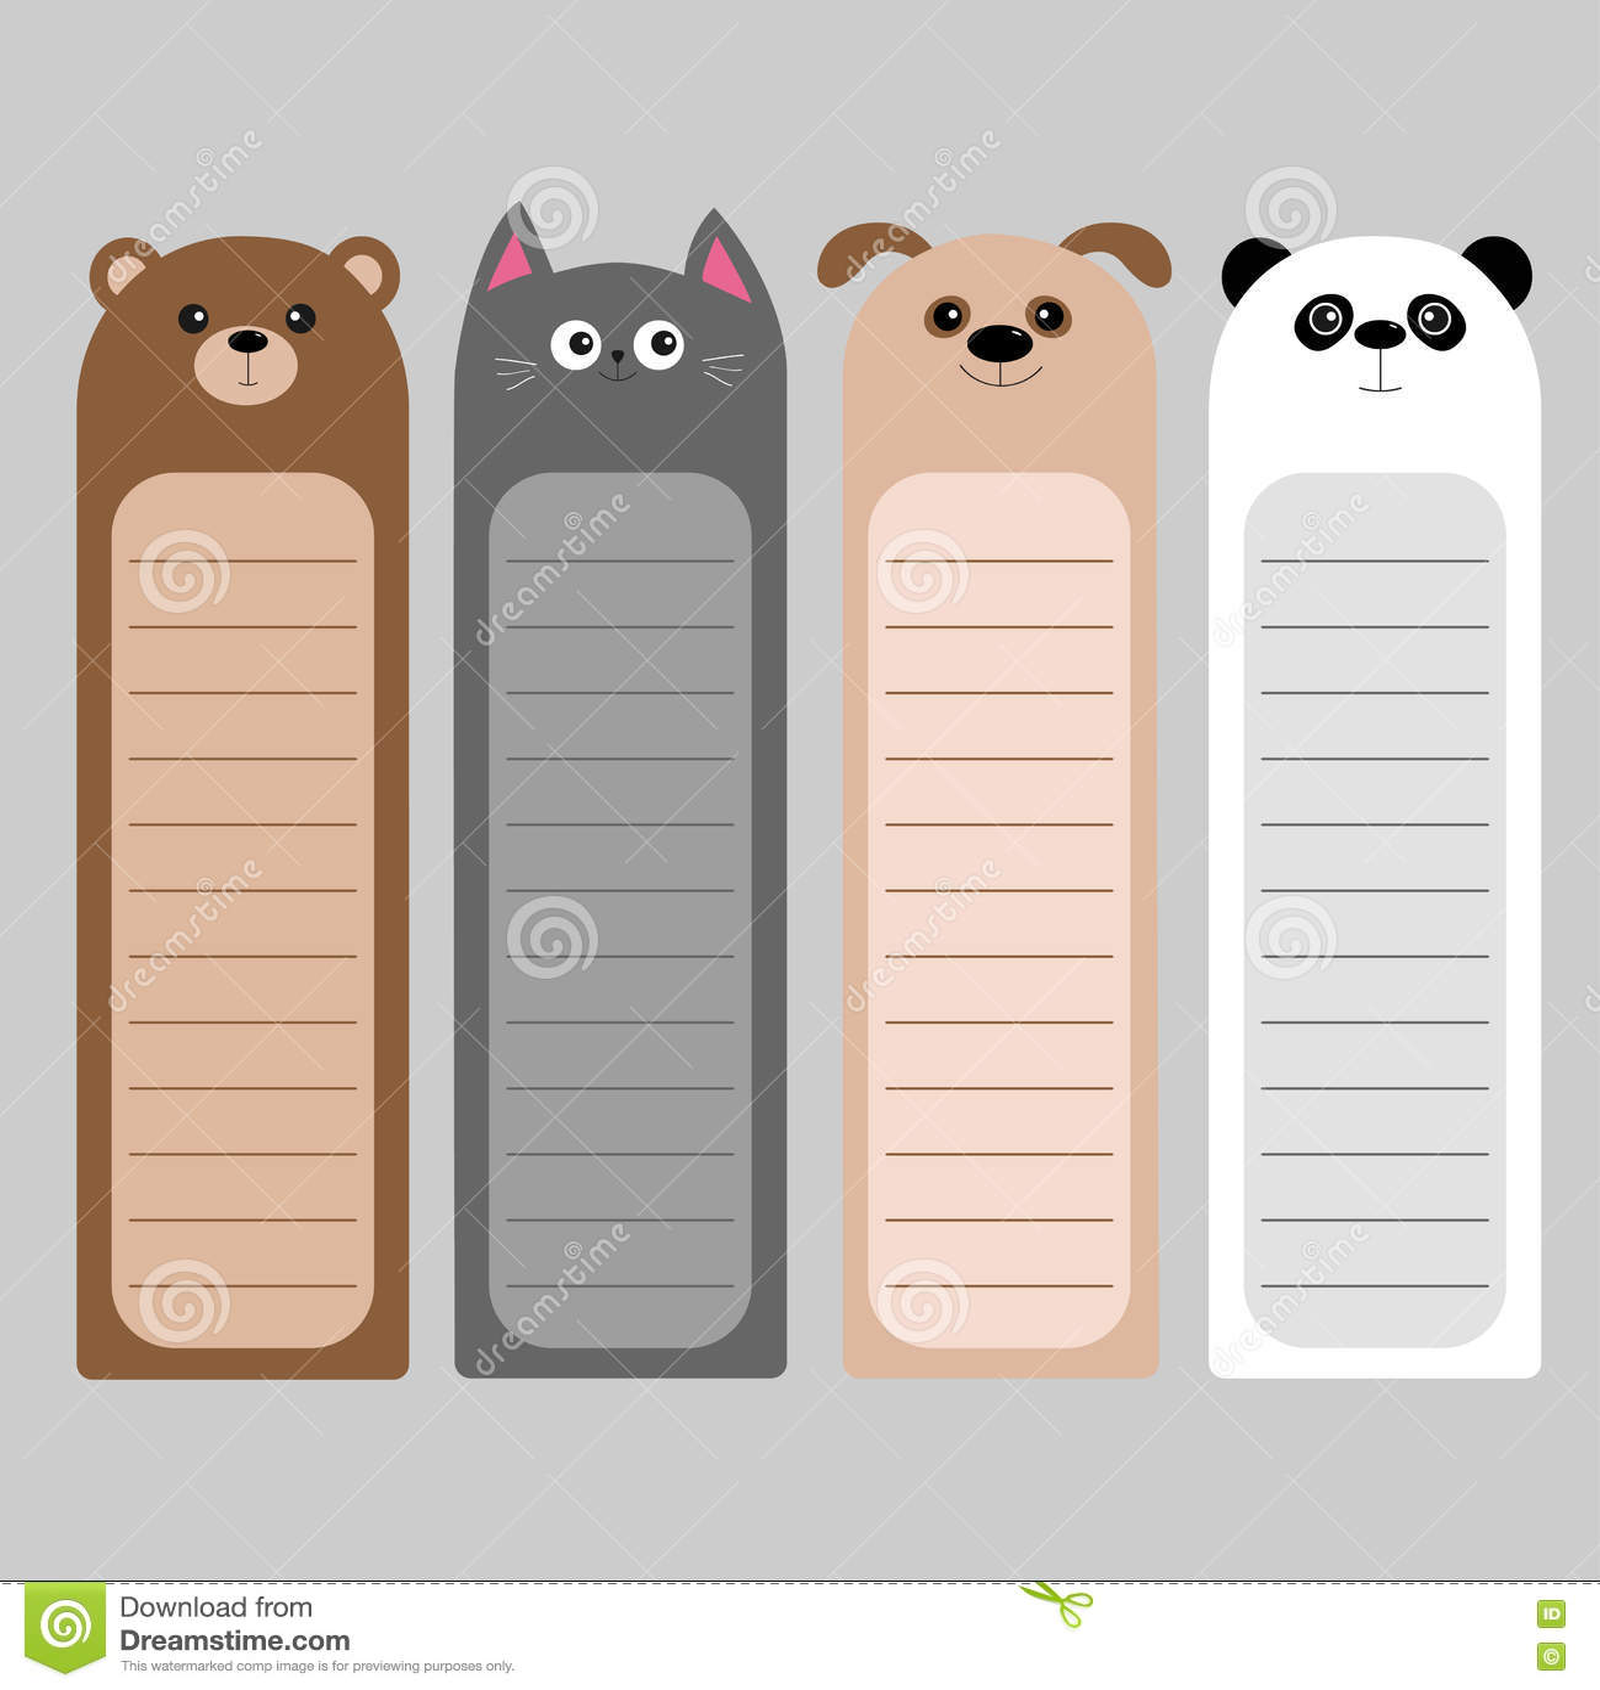 Cartoon Kawaii Baby Bear Cat Dog Panda Animal Head Set